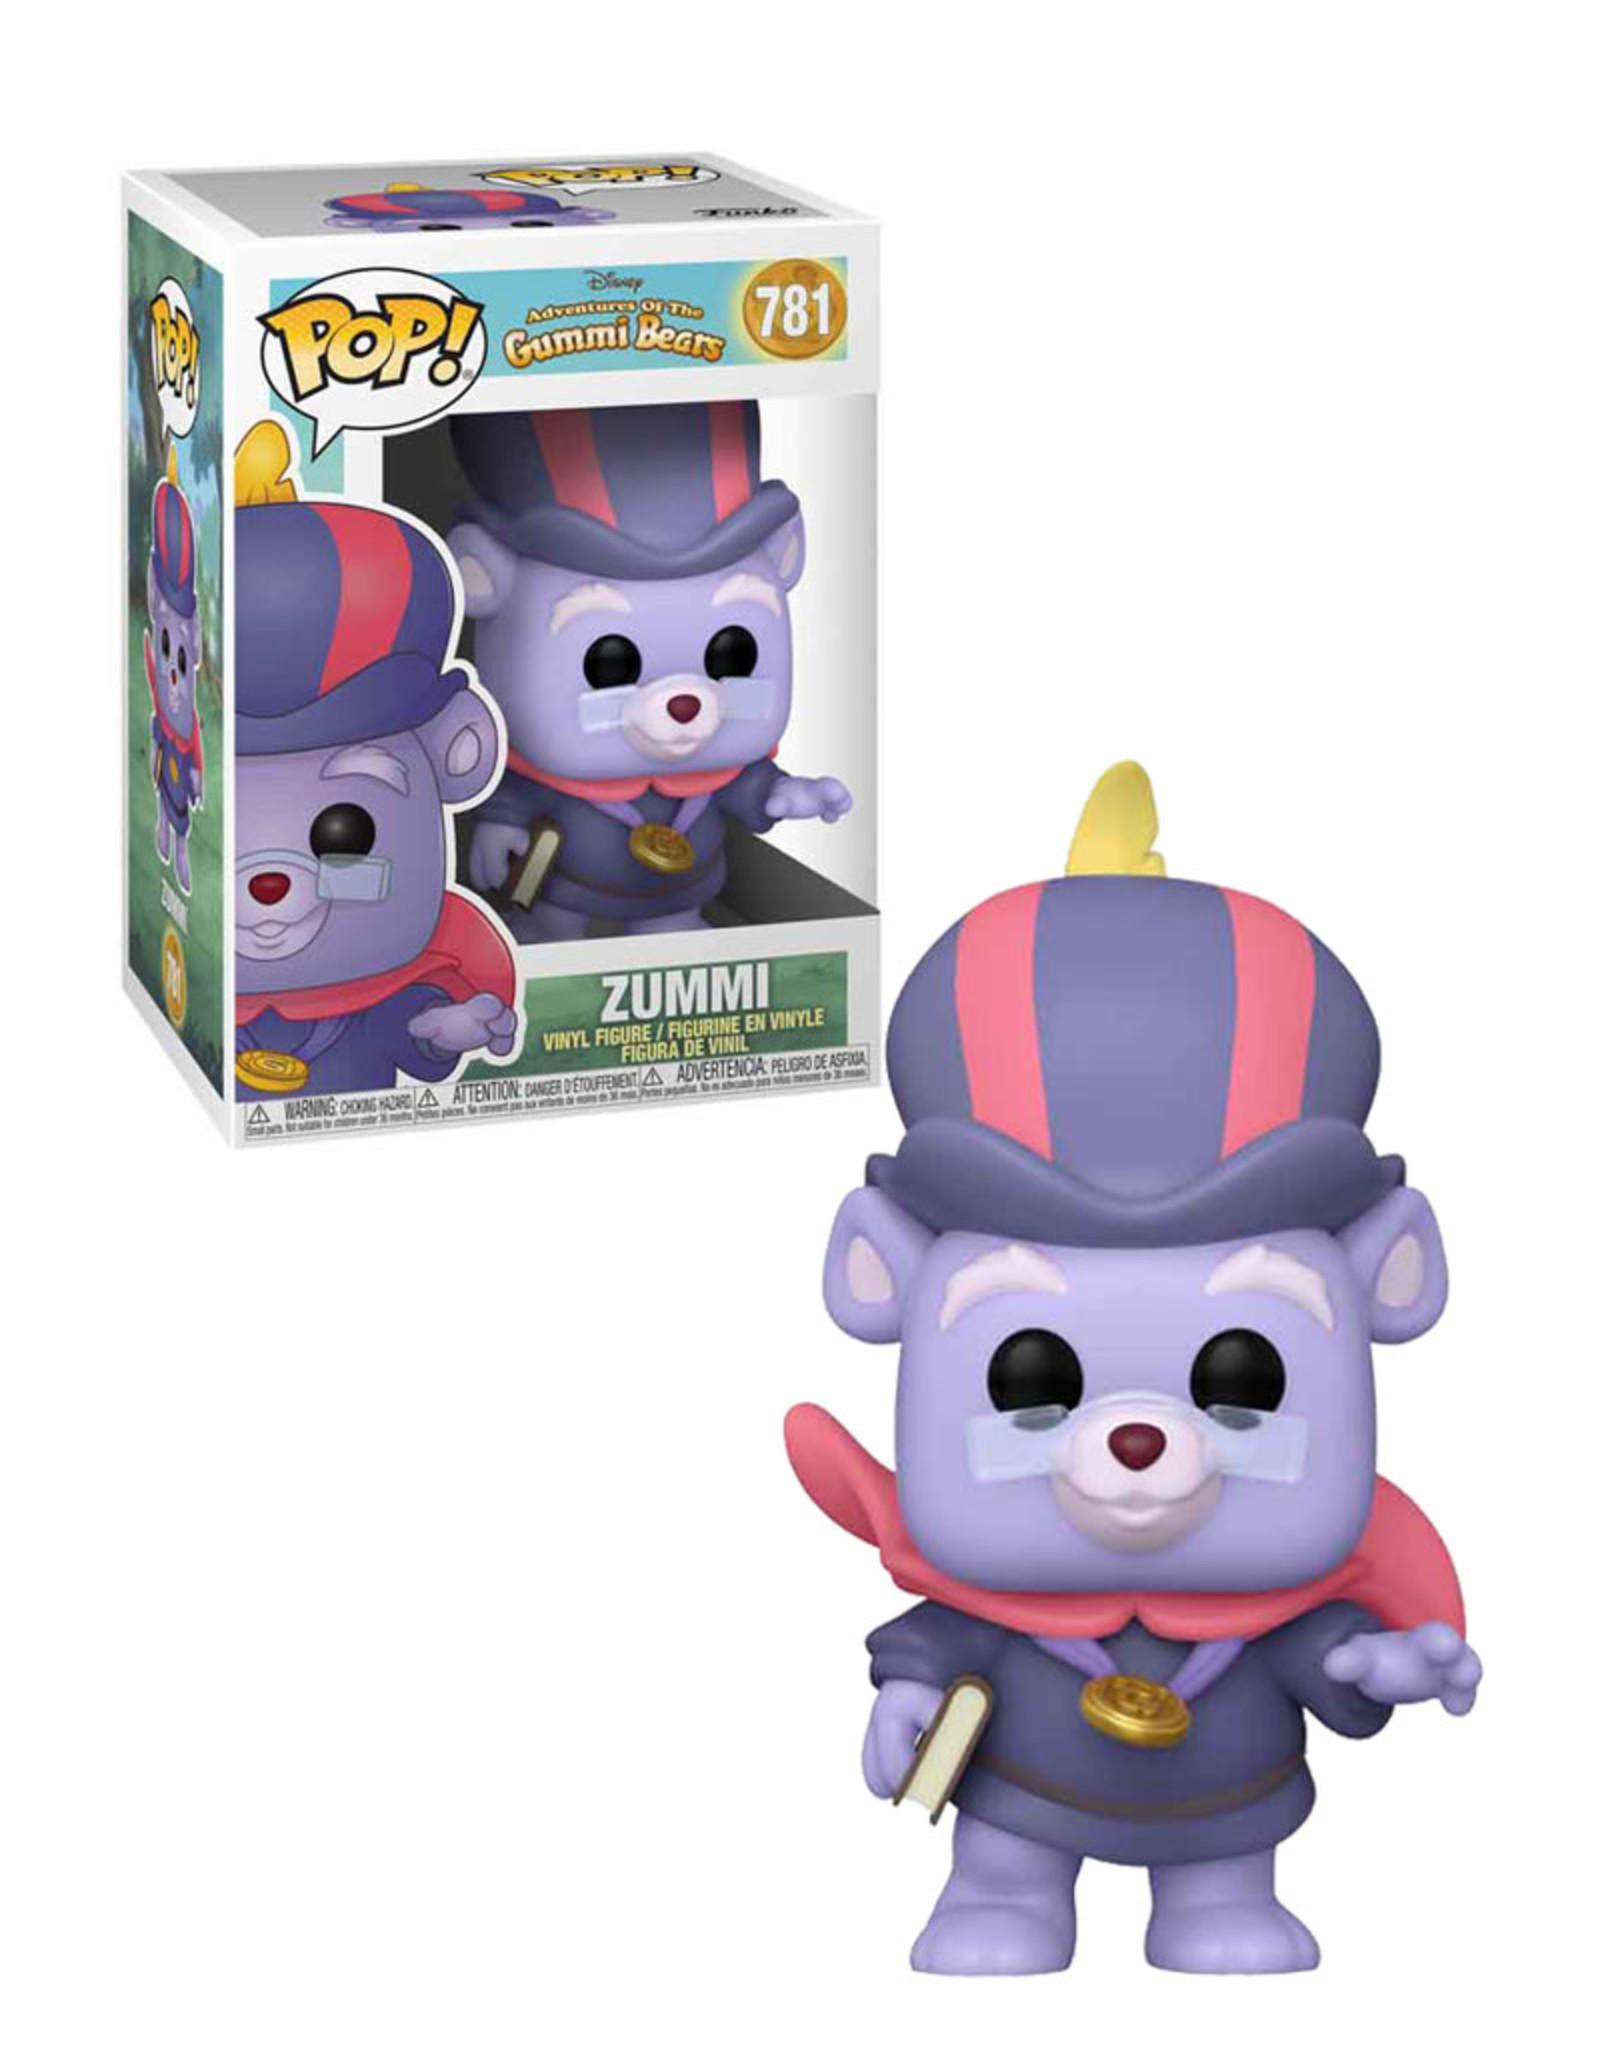 Adventures of the Gummi Bears 781 ( Funko Pop ) Zummi